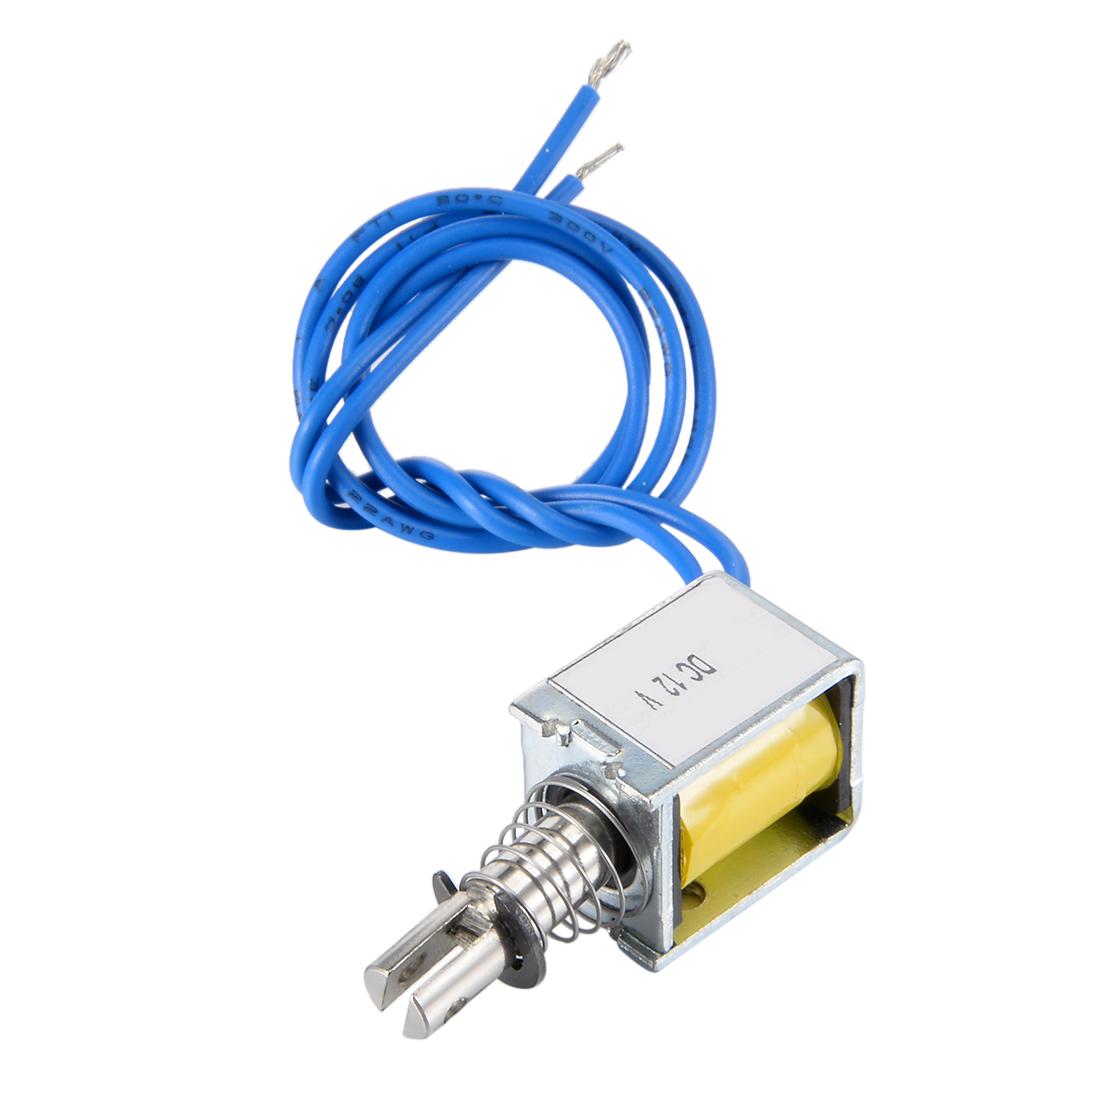 ZYE1(TAU)-0520 DC 12V Pull Type Open Frame Solenoid Electromagnet